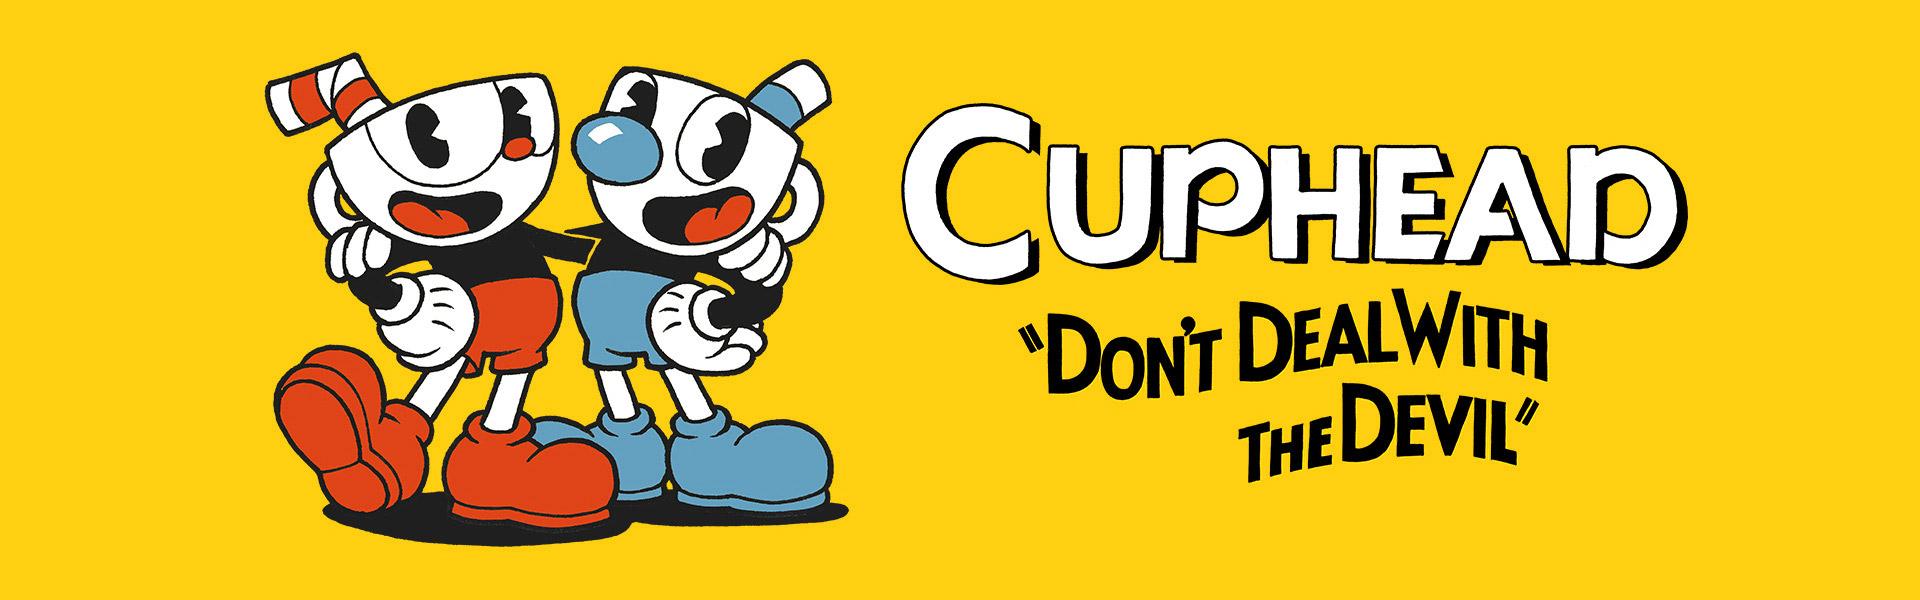 Cuphead, Don't Deal with the Devil, Капхед и Магмен улыбаются, обнявшись друг с другом